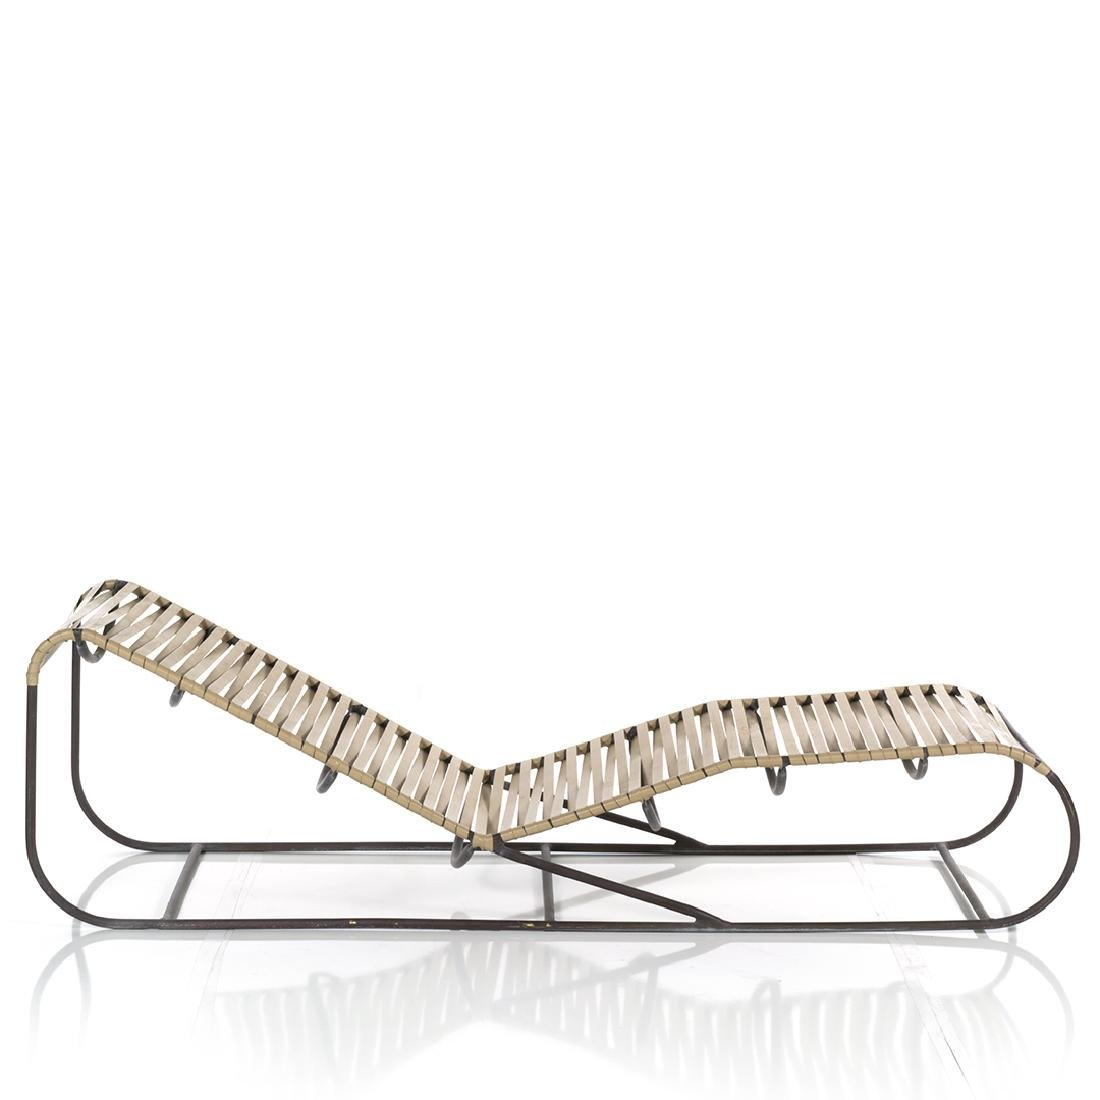 Kipp Stewart Bronze Chaise Lounges (2) - 3